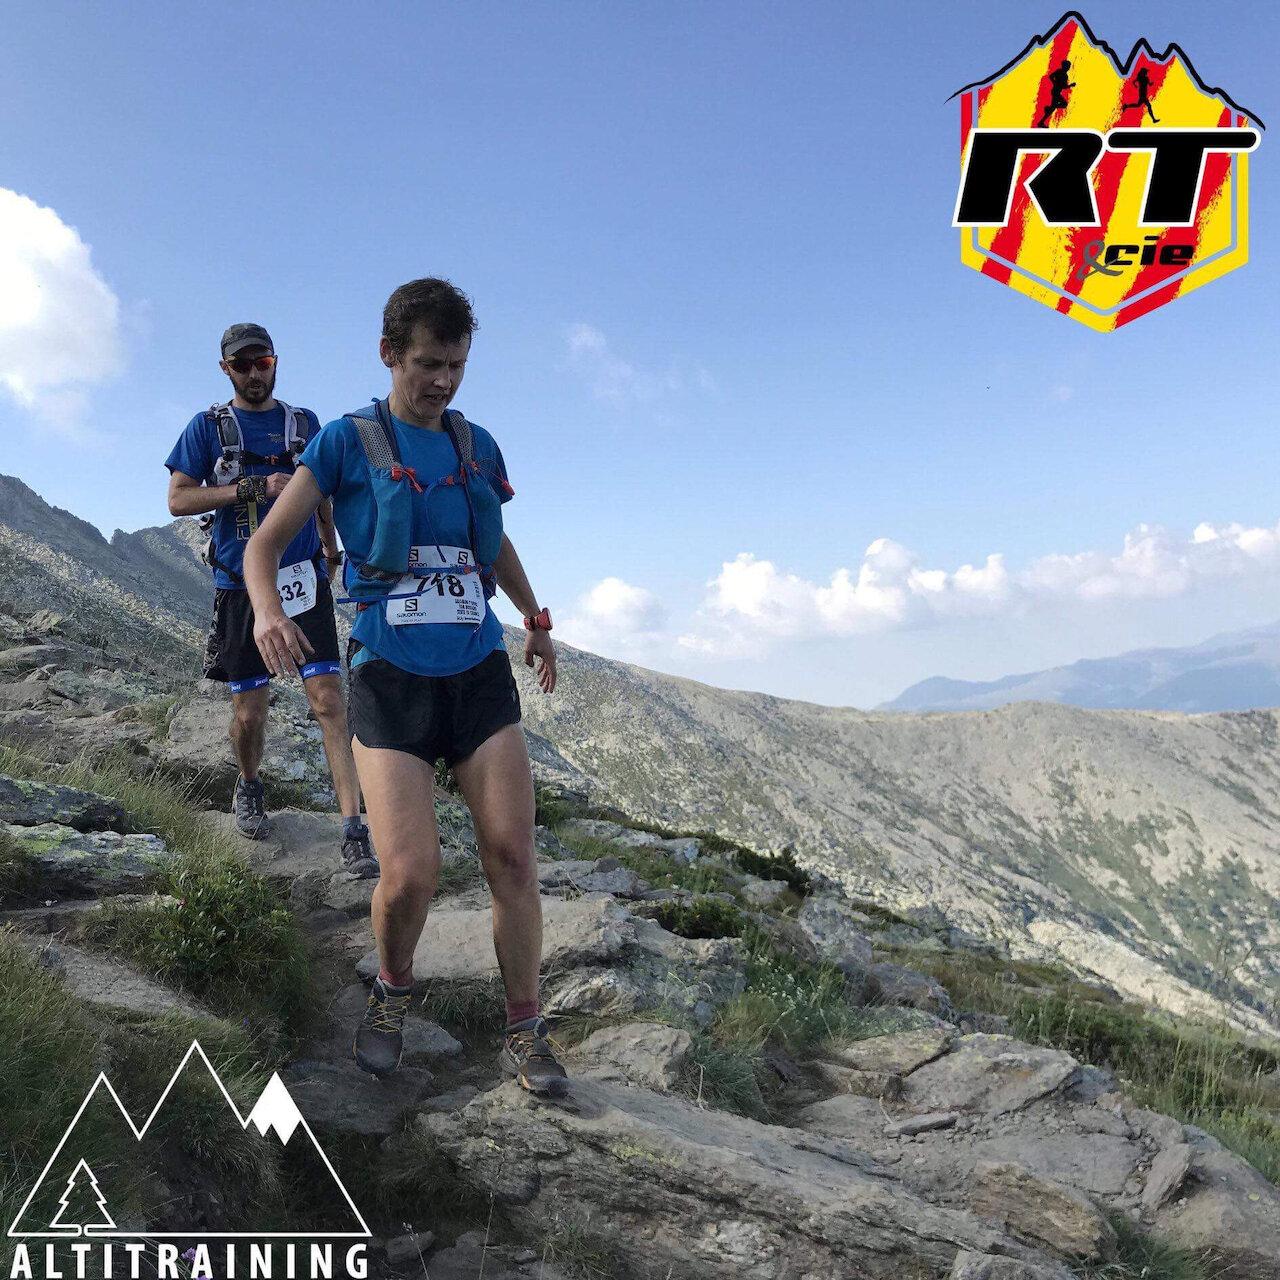 Focussing hard on the descent at the 2018 Championnat du Canigou. Photo curtesy of Running Trail Et Cie 863 Chemin de la Fossella, 66100 Perpignan.